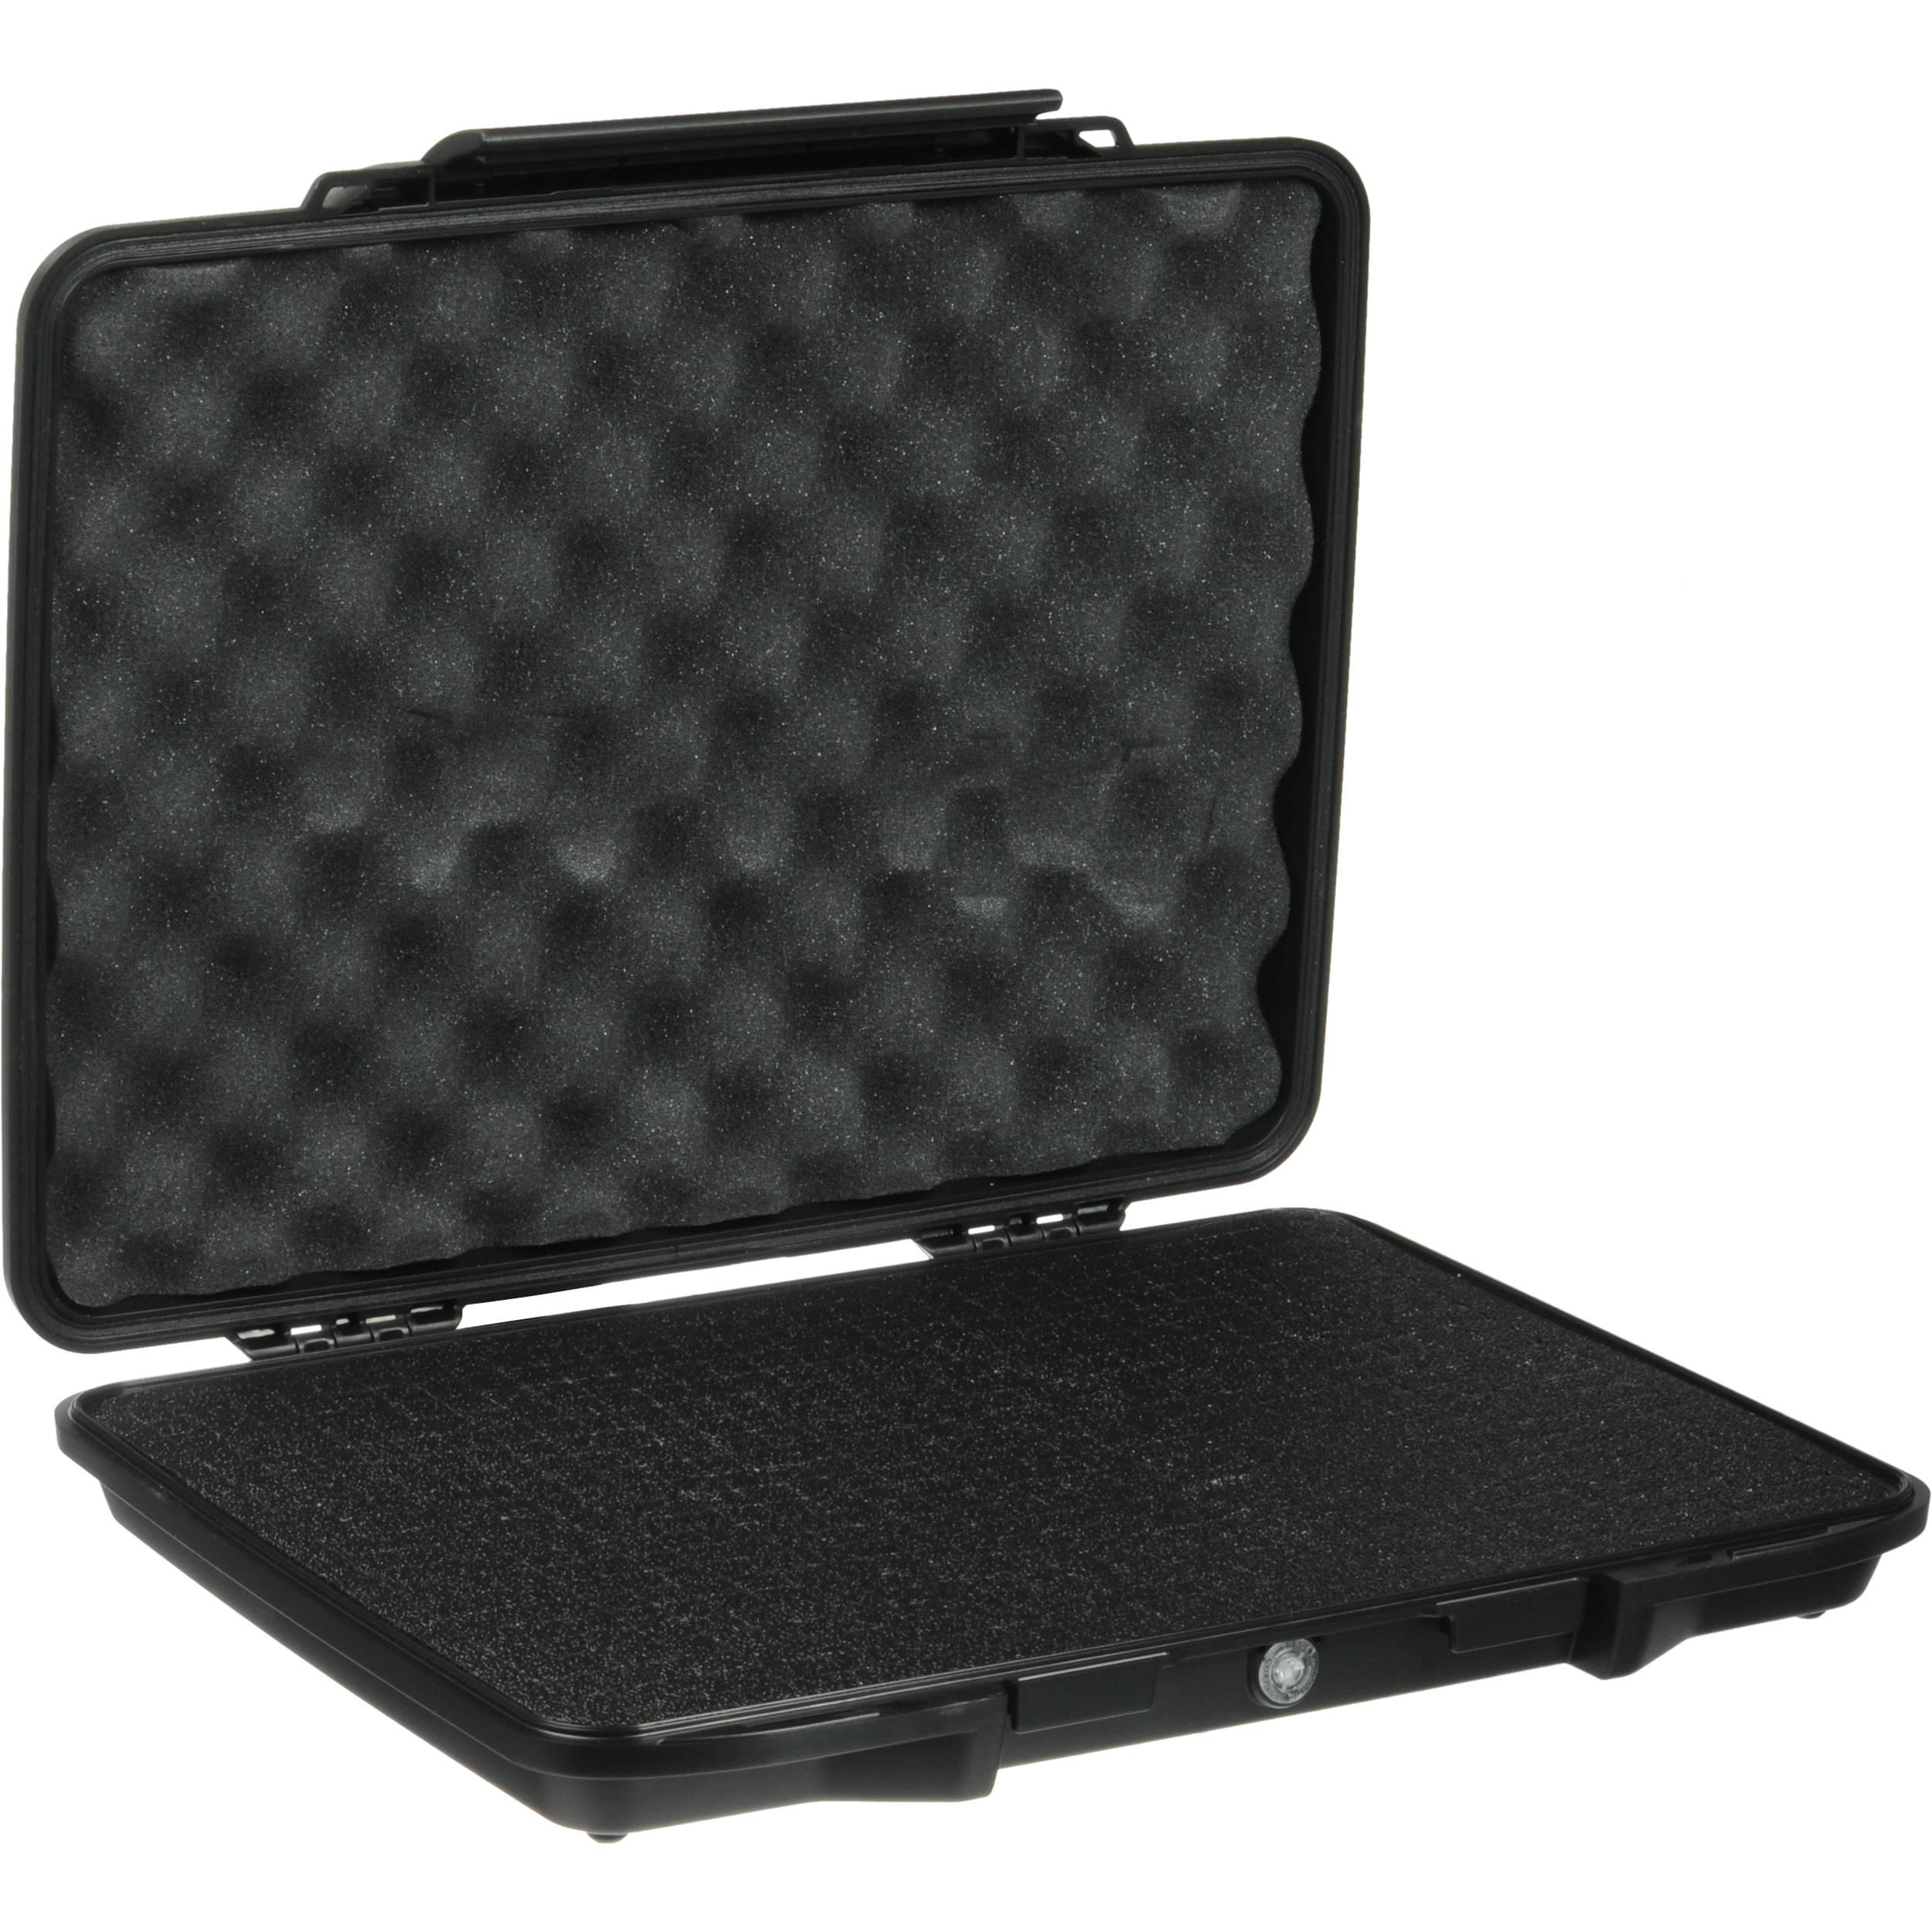 Pelican 1085 Hardback Laptop Computer Case with Foam Black